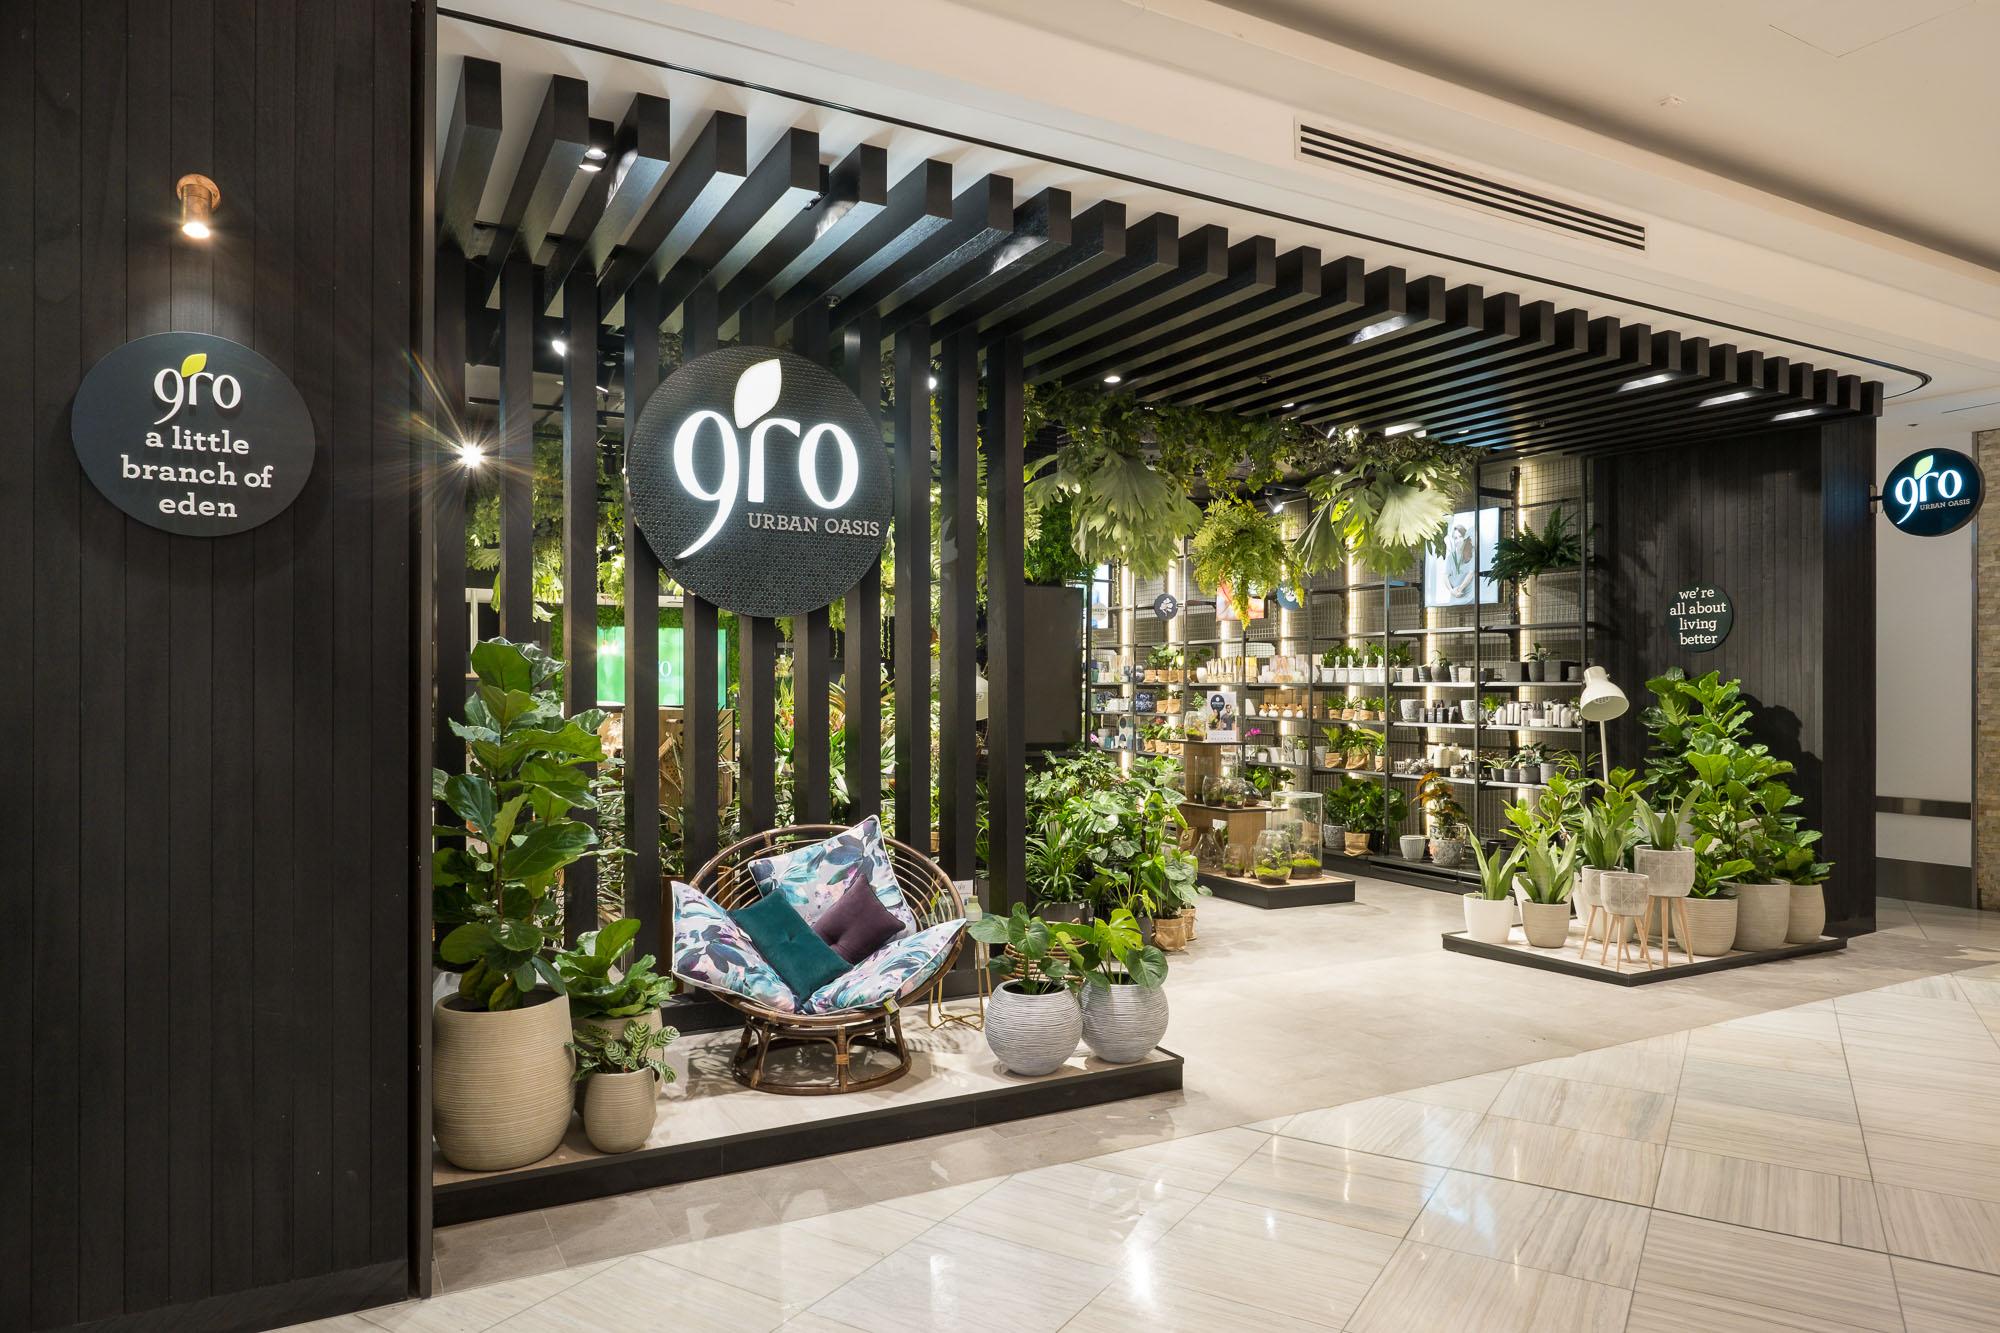 Gro Urban Oasis